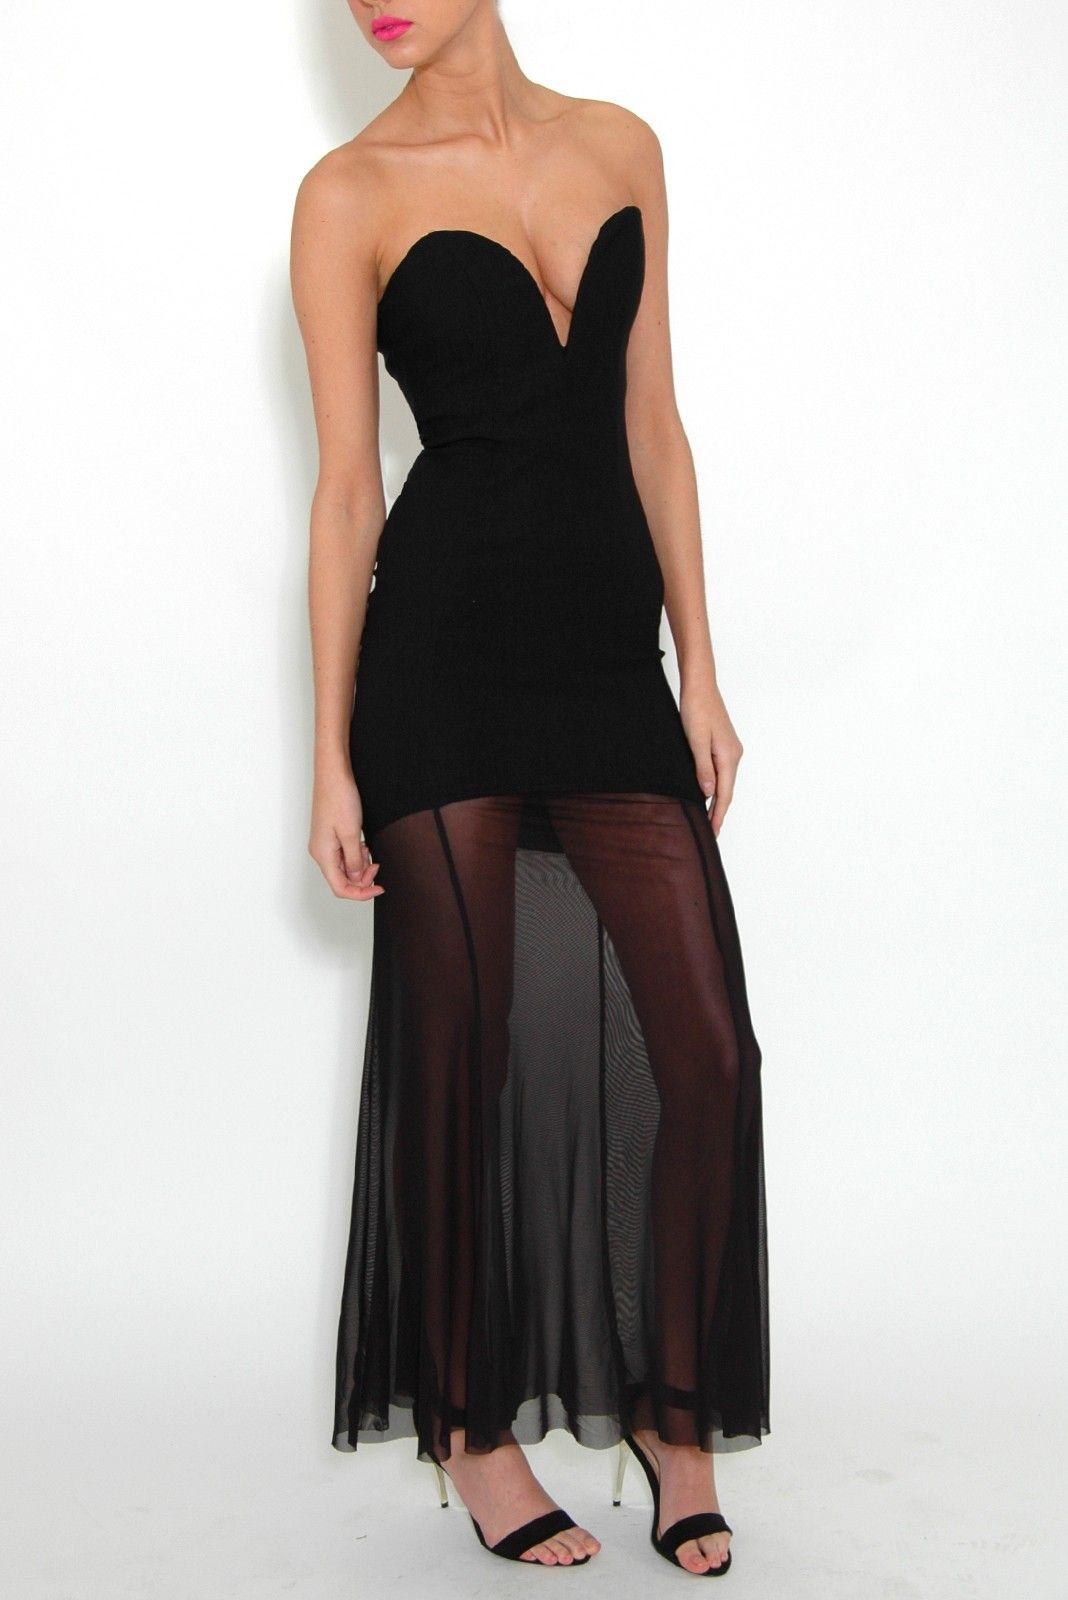 Park Art My WordPress Blog_Black Cut Out Dress Maxi